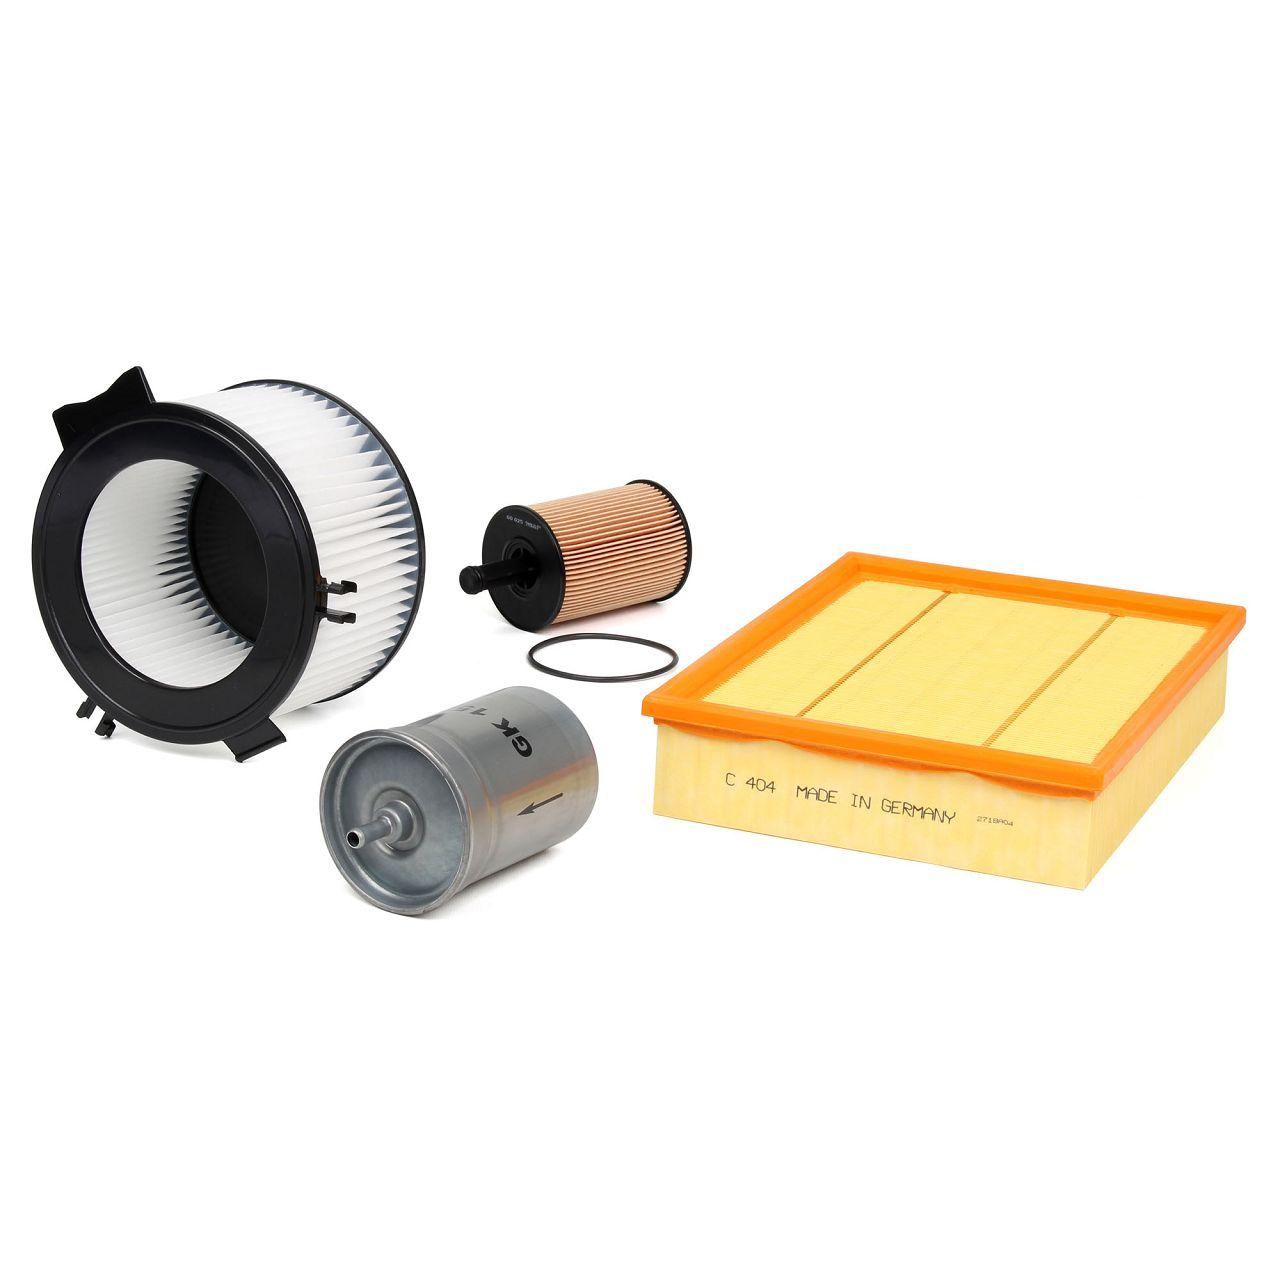 Inspektionskit Filterpaket Filterset für VW TRANSPORTER T4 2.8 VR6 204 PS